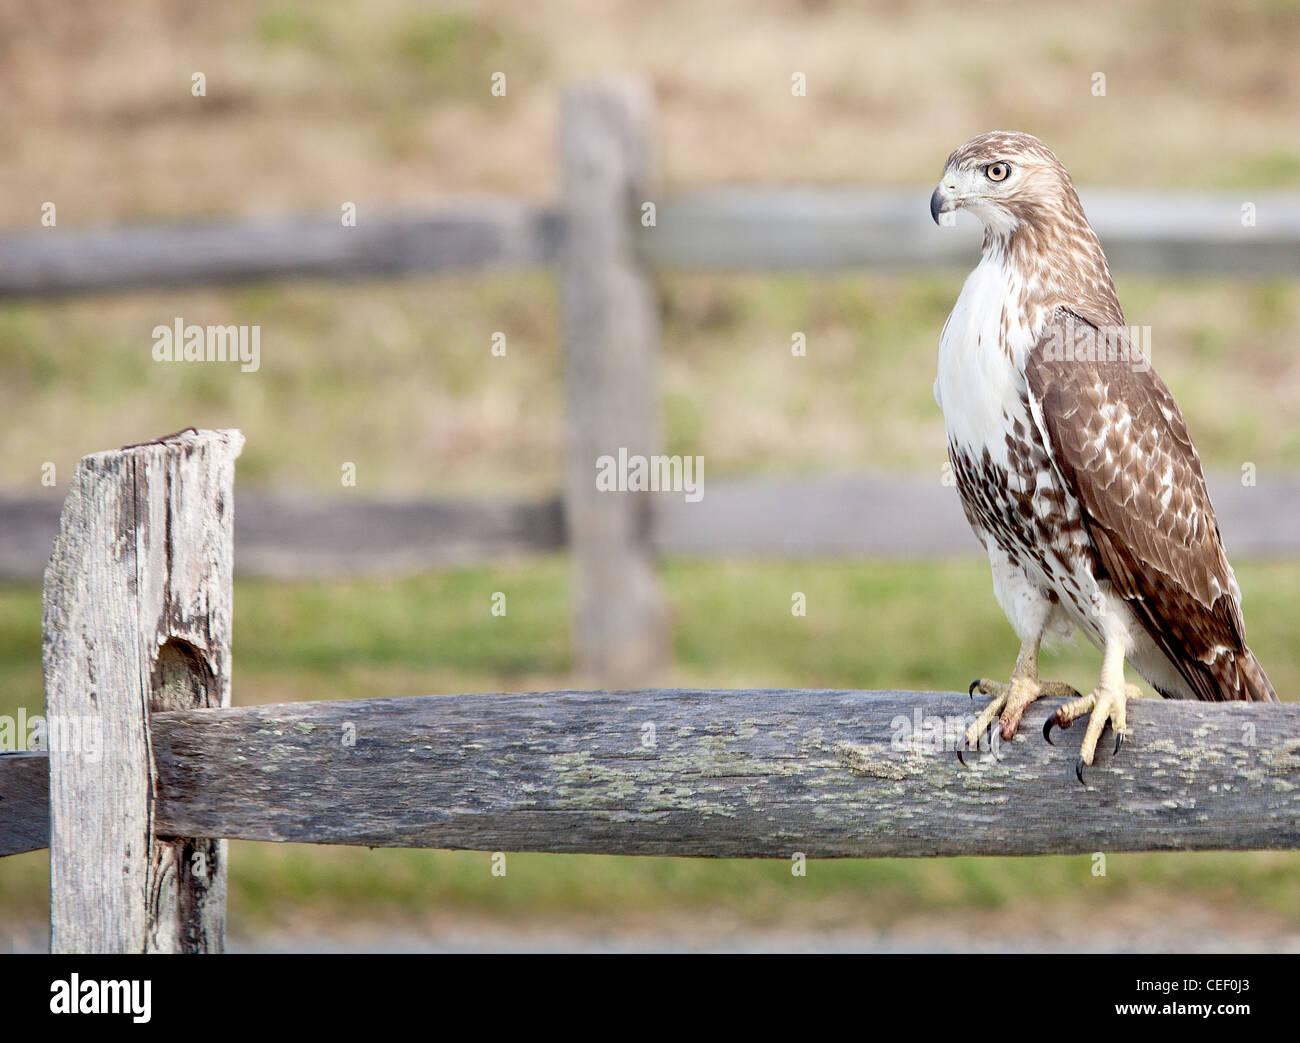 [Image: close-up-of-confident-red-tail-hawk-sitt...CEF0J3.jpg]